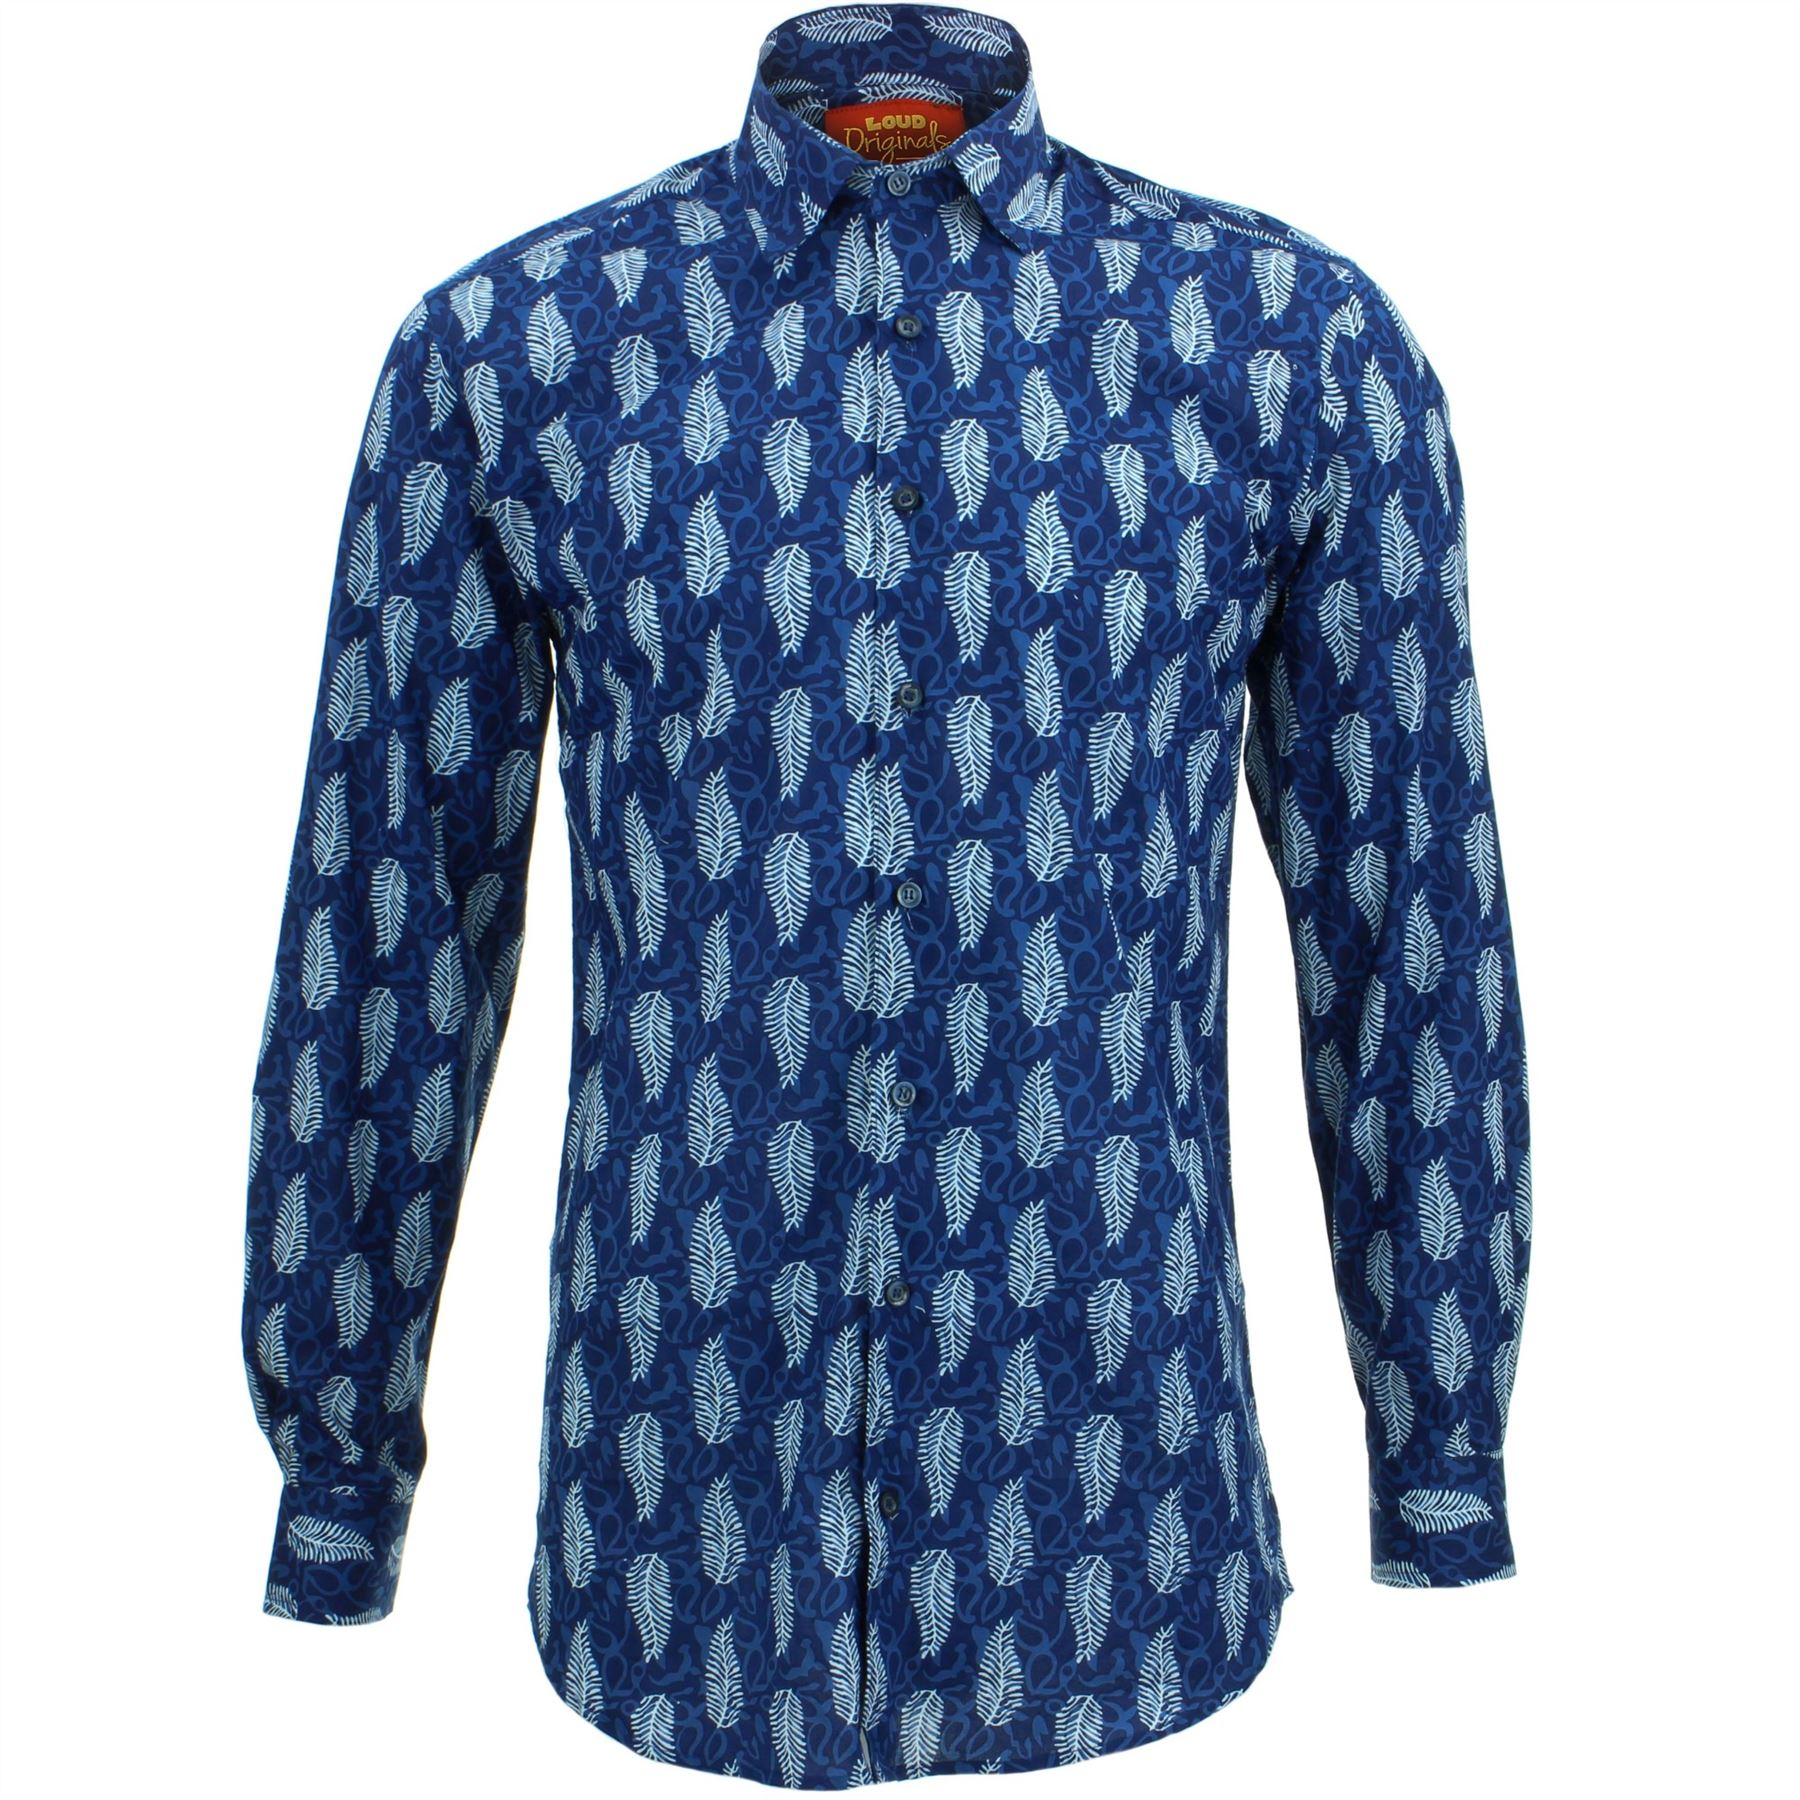 Mens Shirt Loud Originals SLIM FIT Abstract Blue Retro Psychedelic Fancy